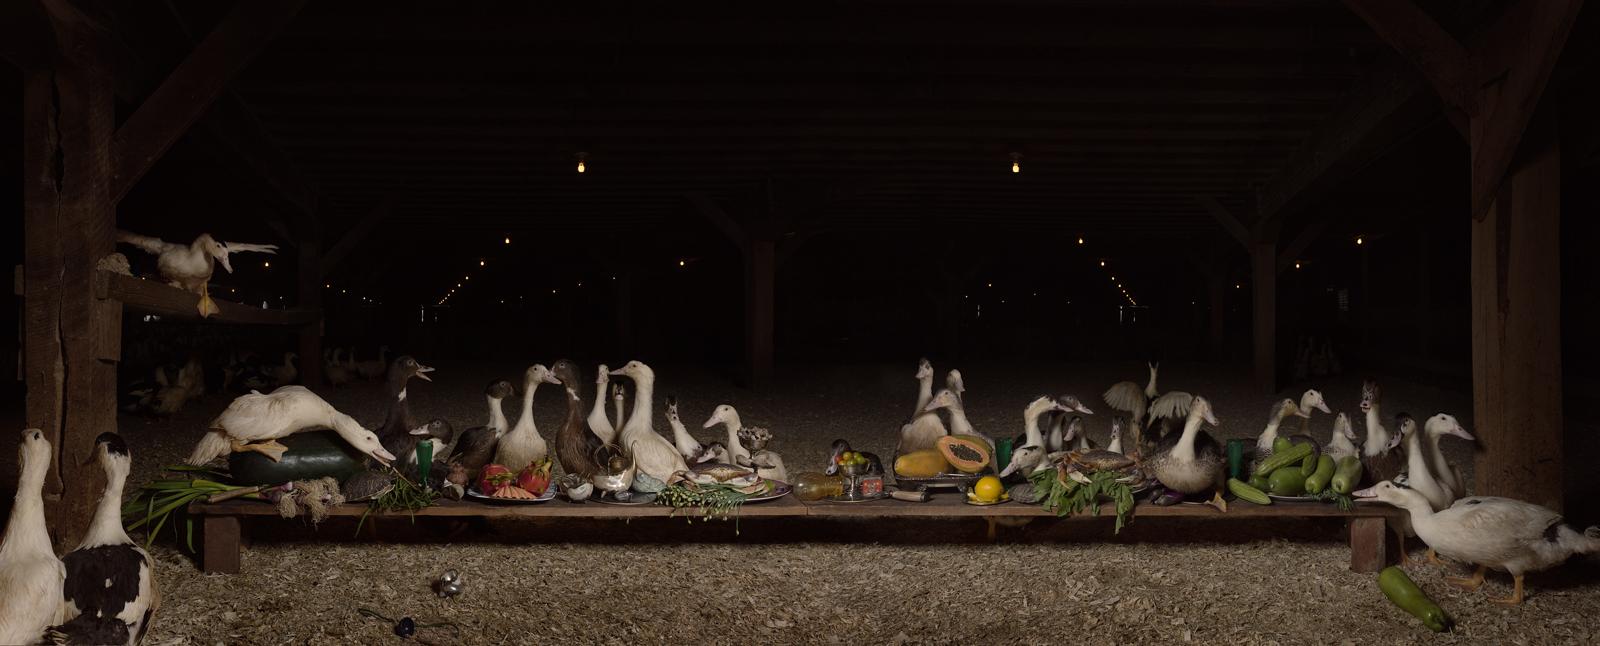 "The Moulard Feast   United States, 2014  10""x25"" | 20""x50"" | 40""x100"""